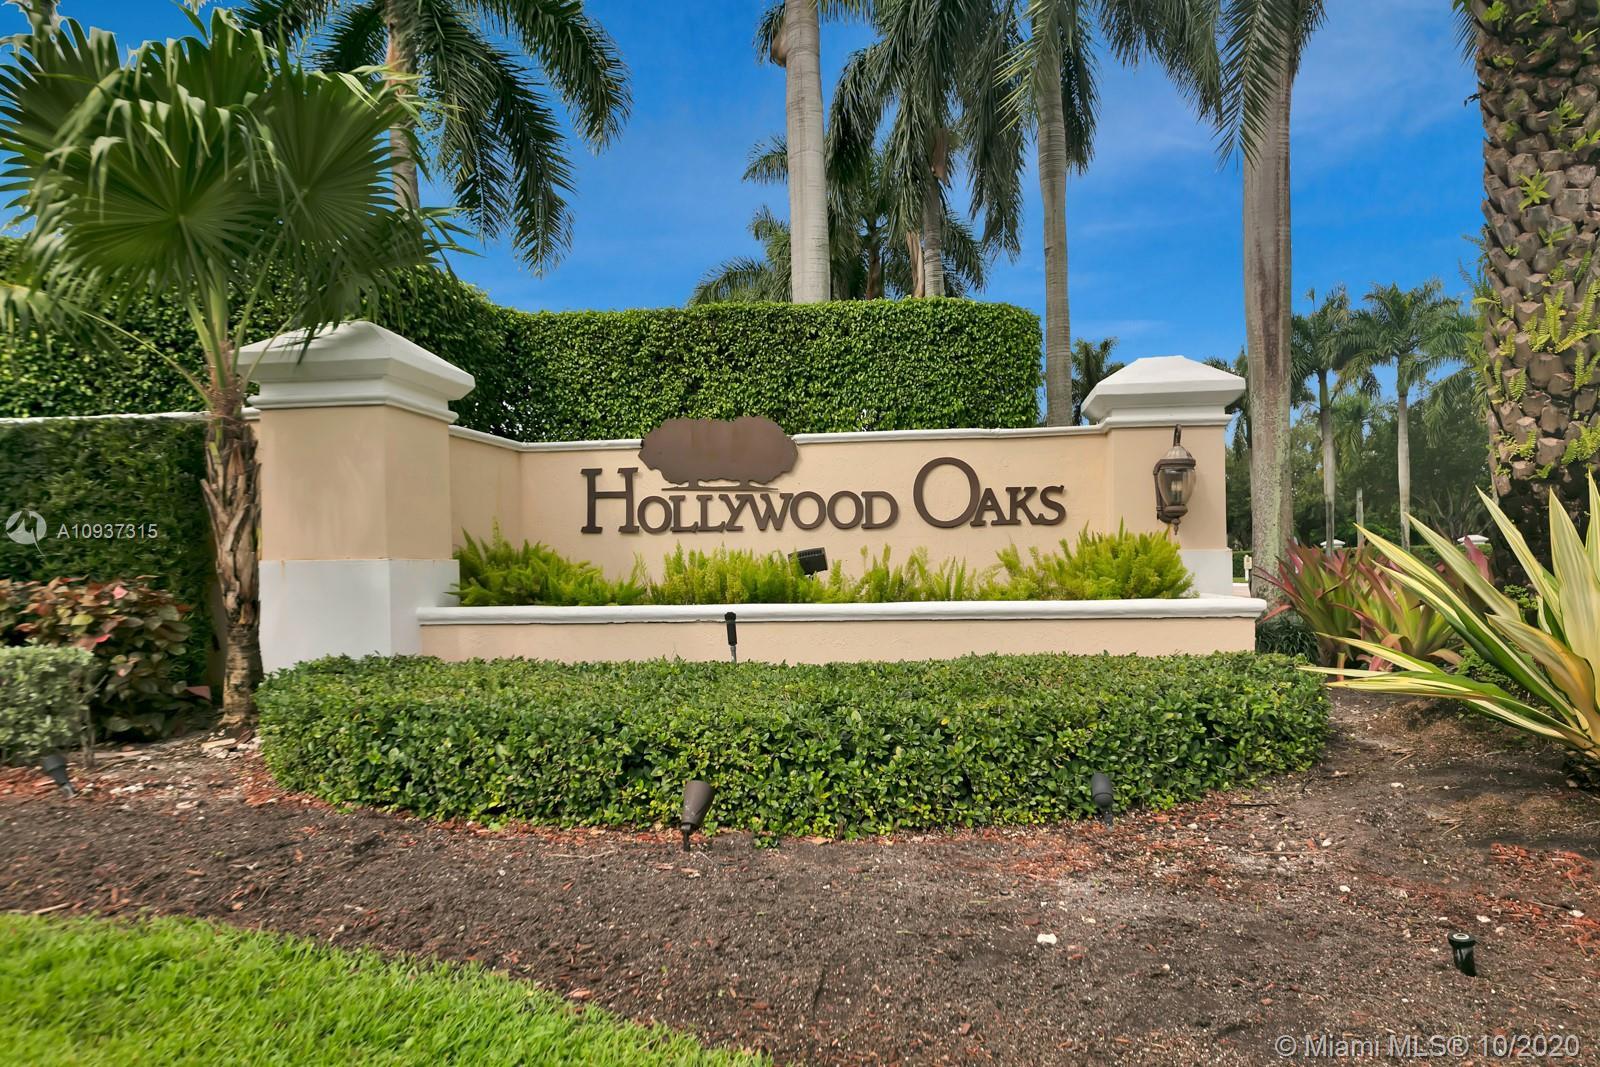 Hollywood Oaks - 3624 Estate Oak Cir, Hollywood, FL 33312